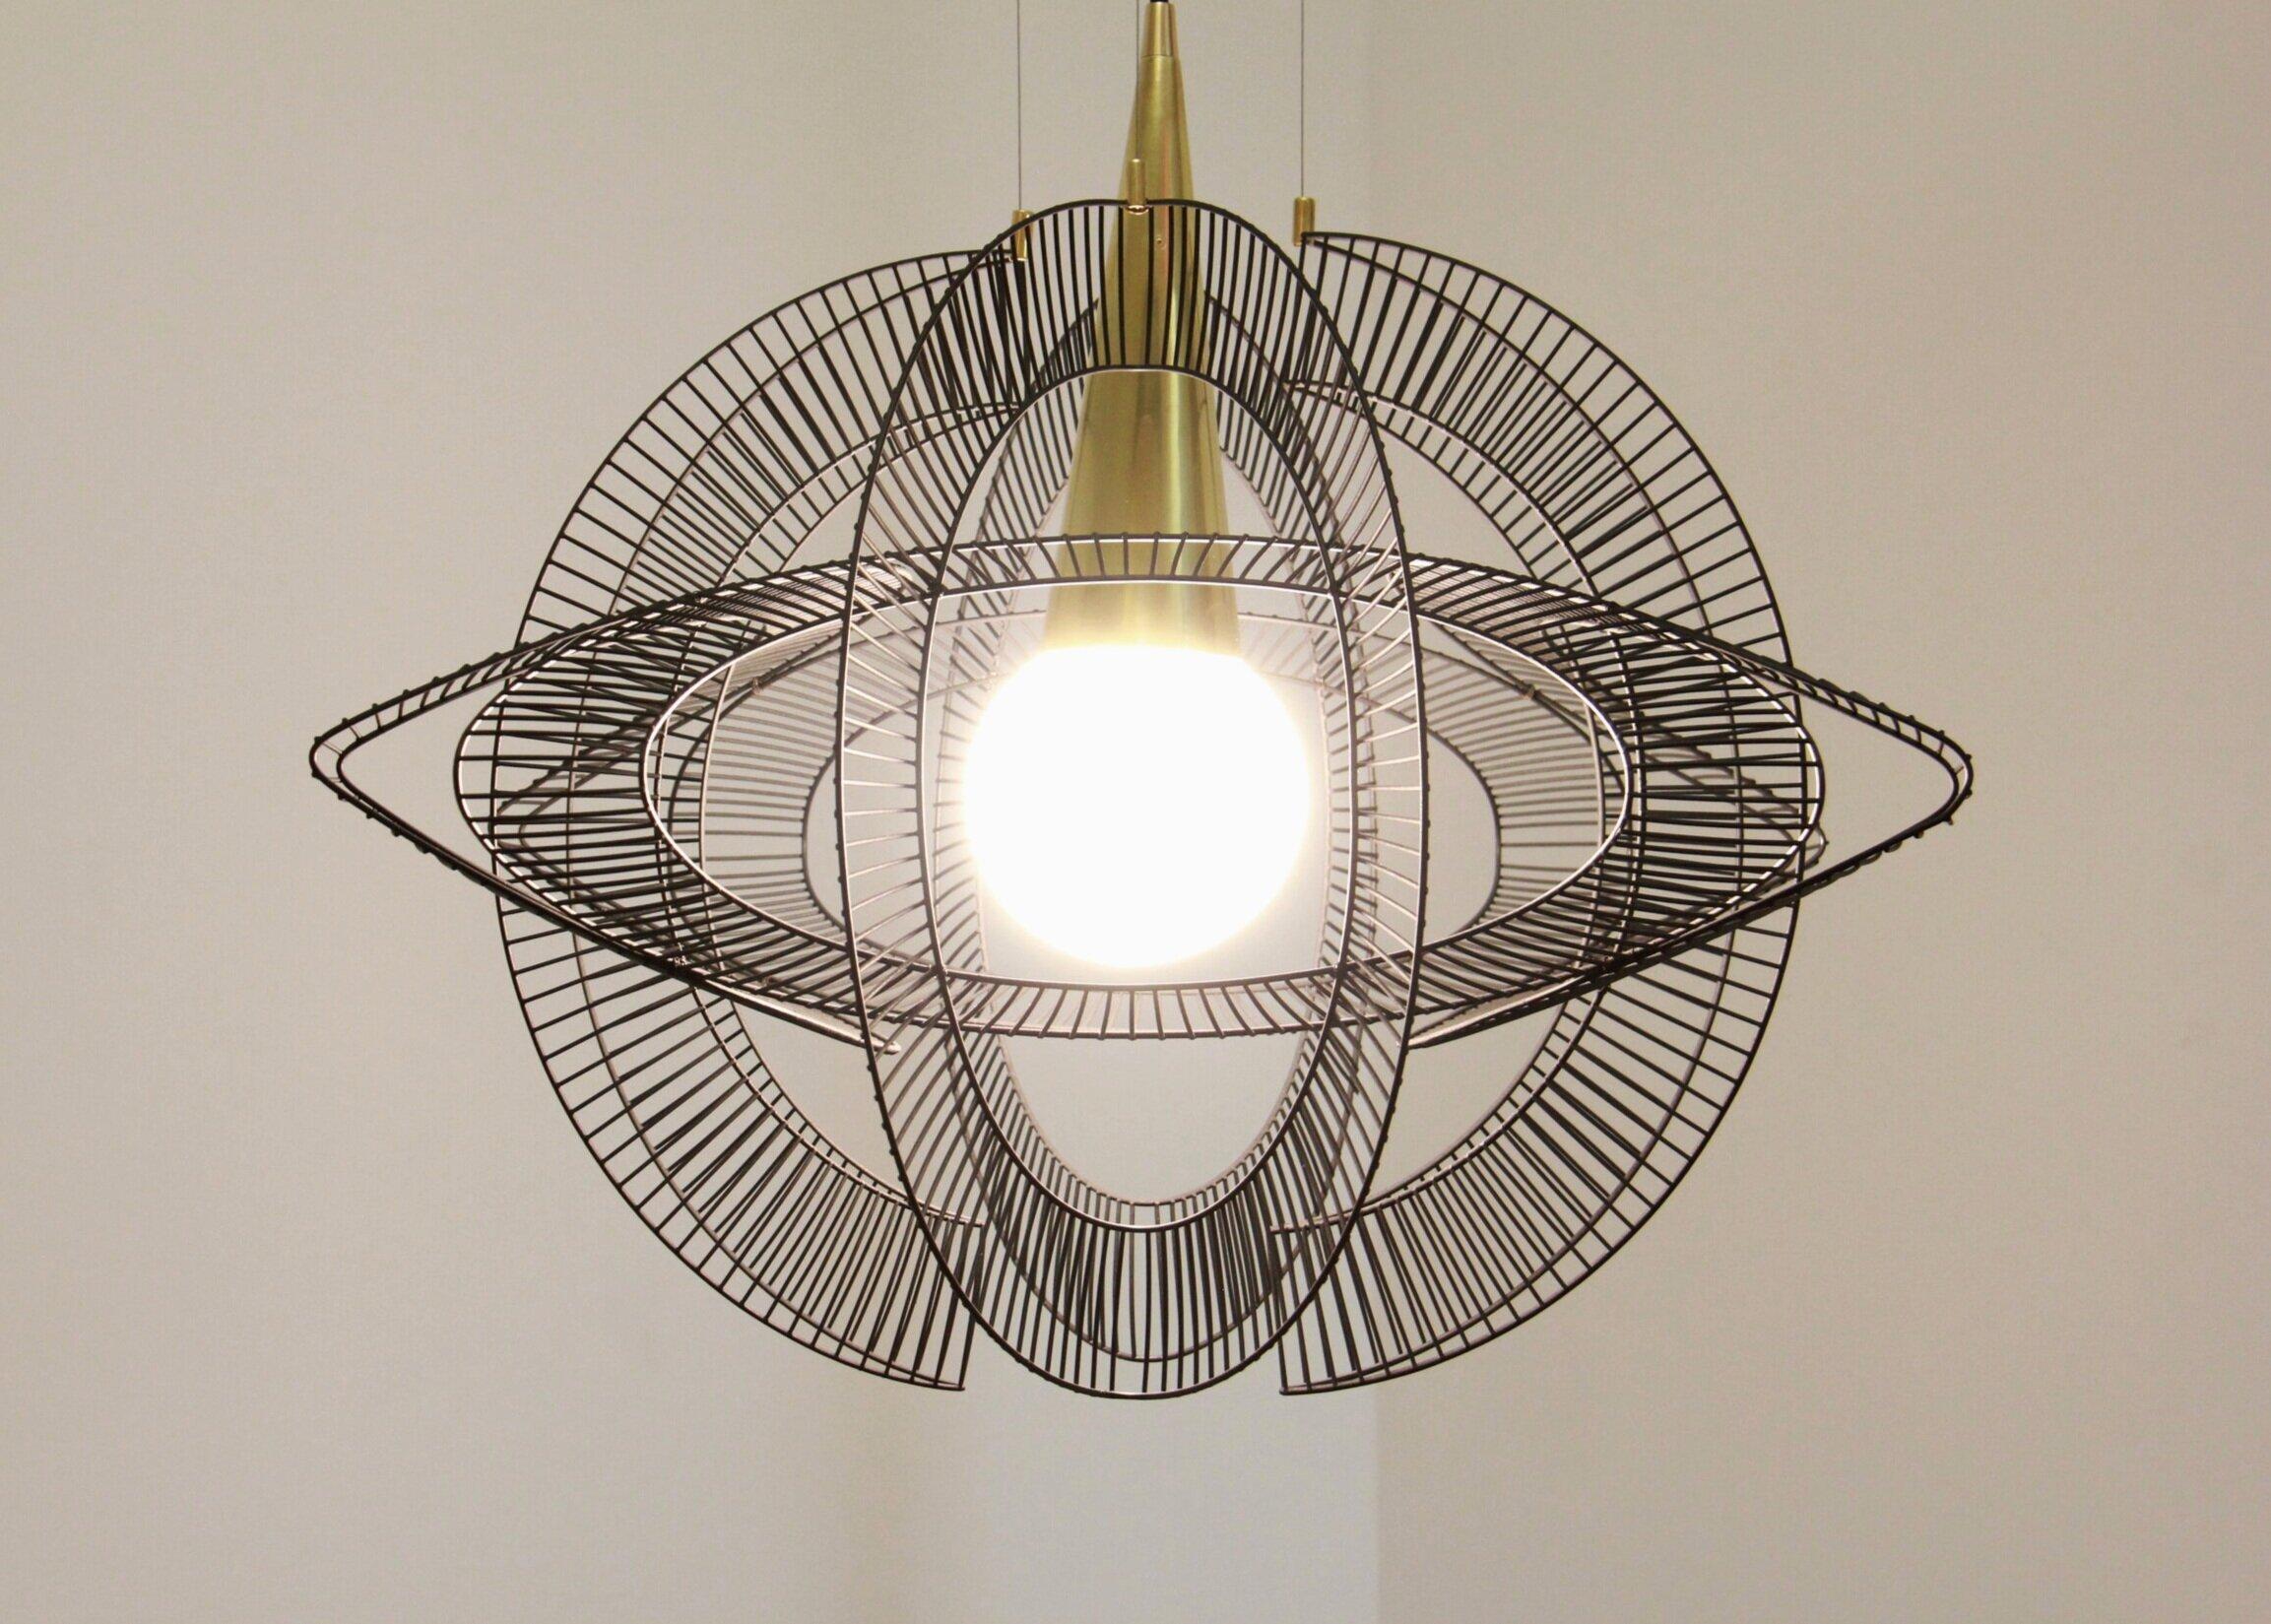 Olas_Sphera_black_brass_luminaire_design_lampe_lamp_studio-botte_pendant 1.JPG